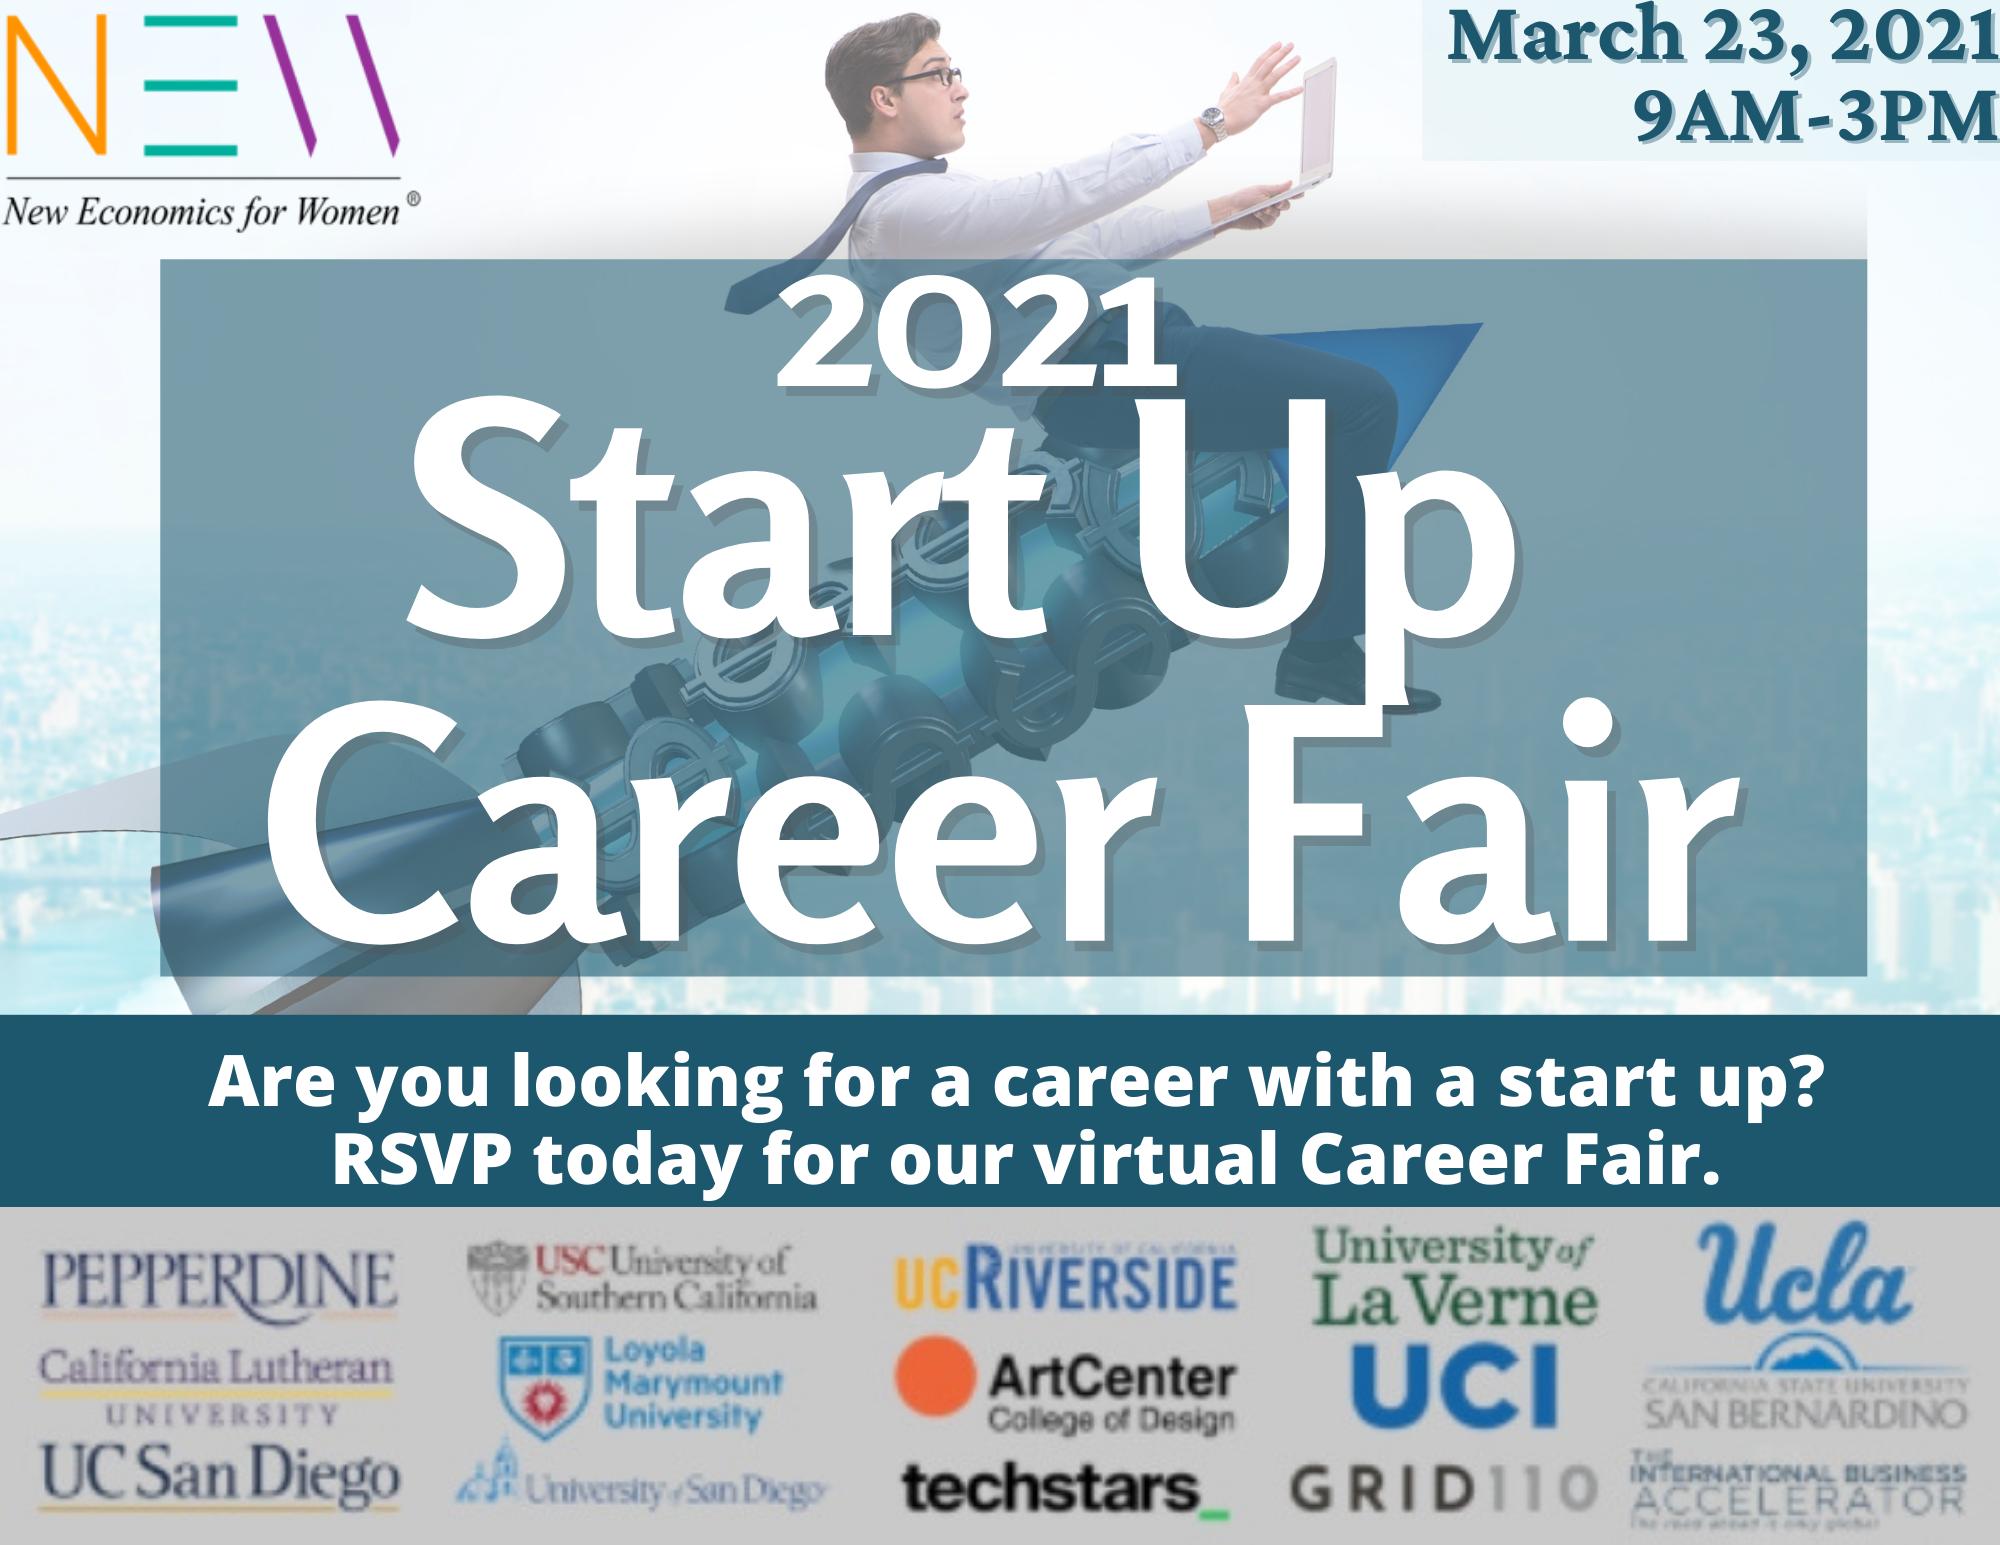 Stephen Semprevivo Contributes to Startup Career Fair